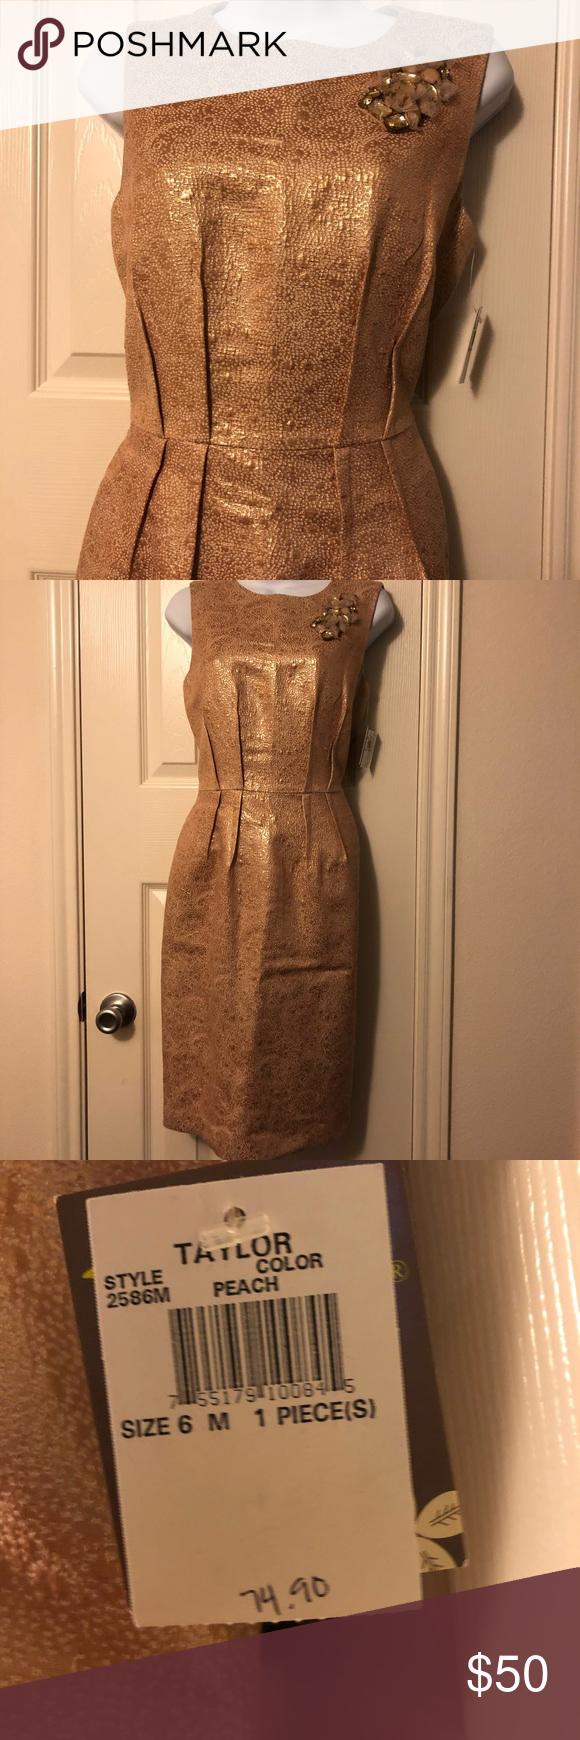 Taylor Dress Size 6 Nwt Taylor Dress Size 6 Nwt Taylor Dresses Wedding Guest Dress Guest Dresses Plus Size Wedding Guest Dresses [ png ]